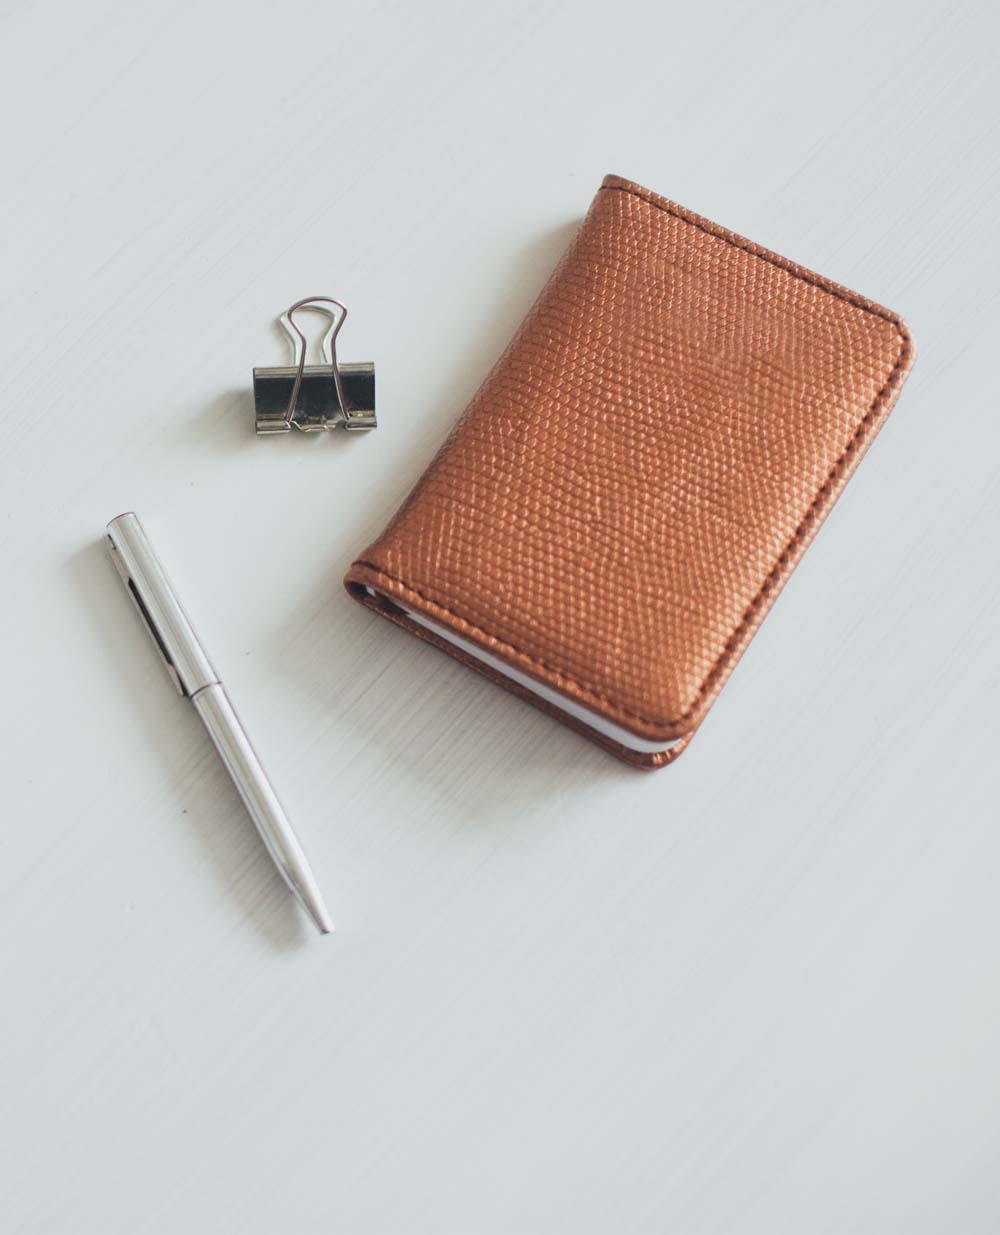 Diary-and-Pen.jpg